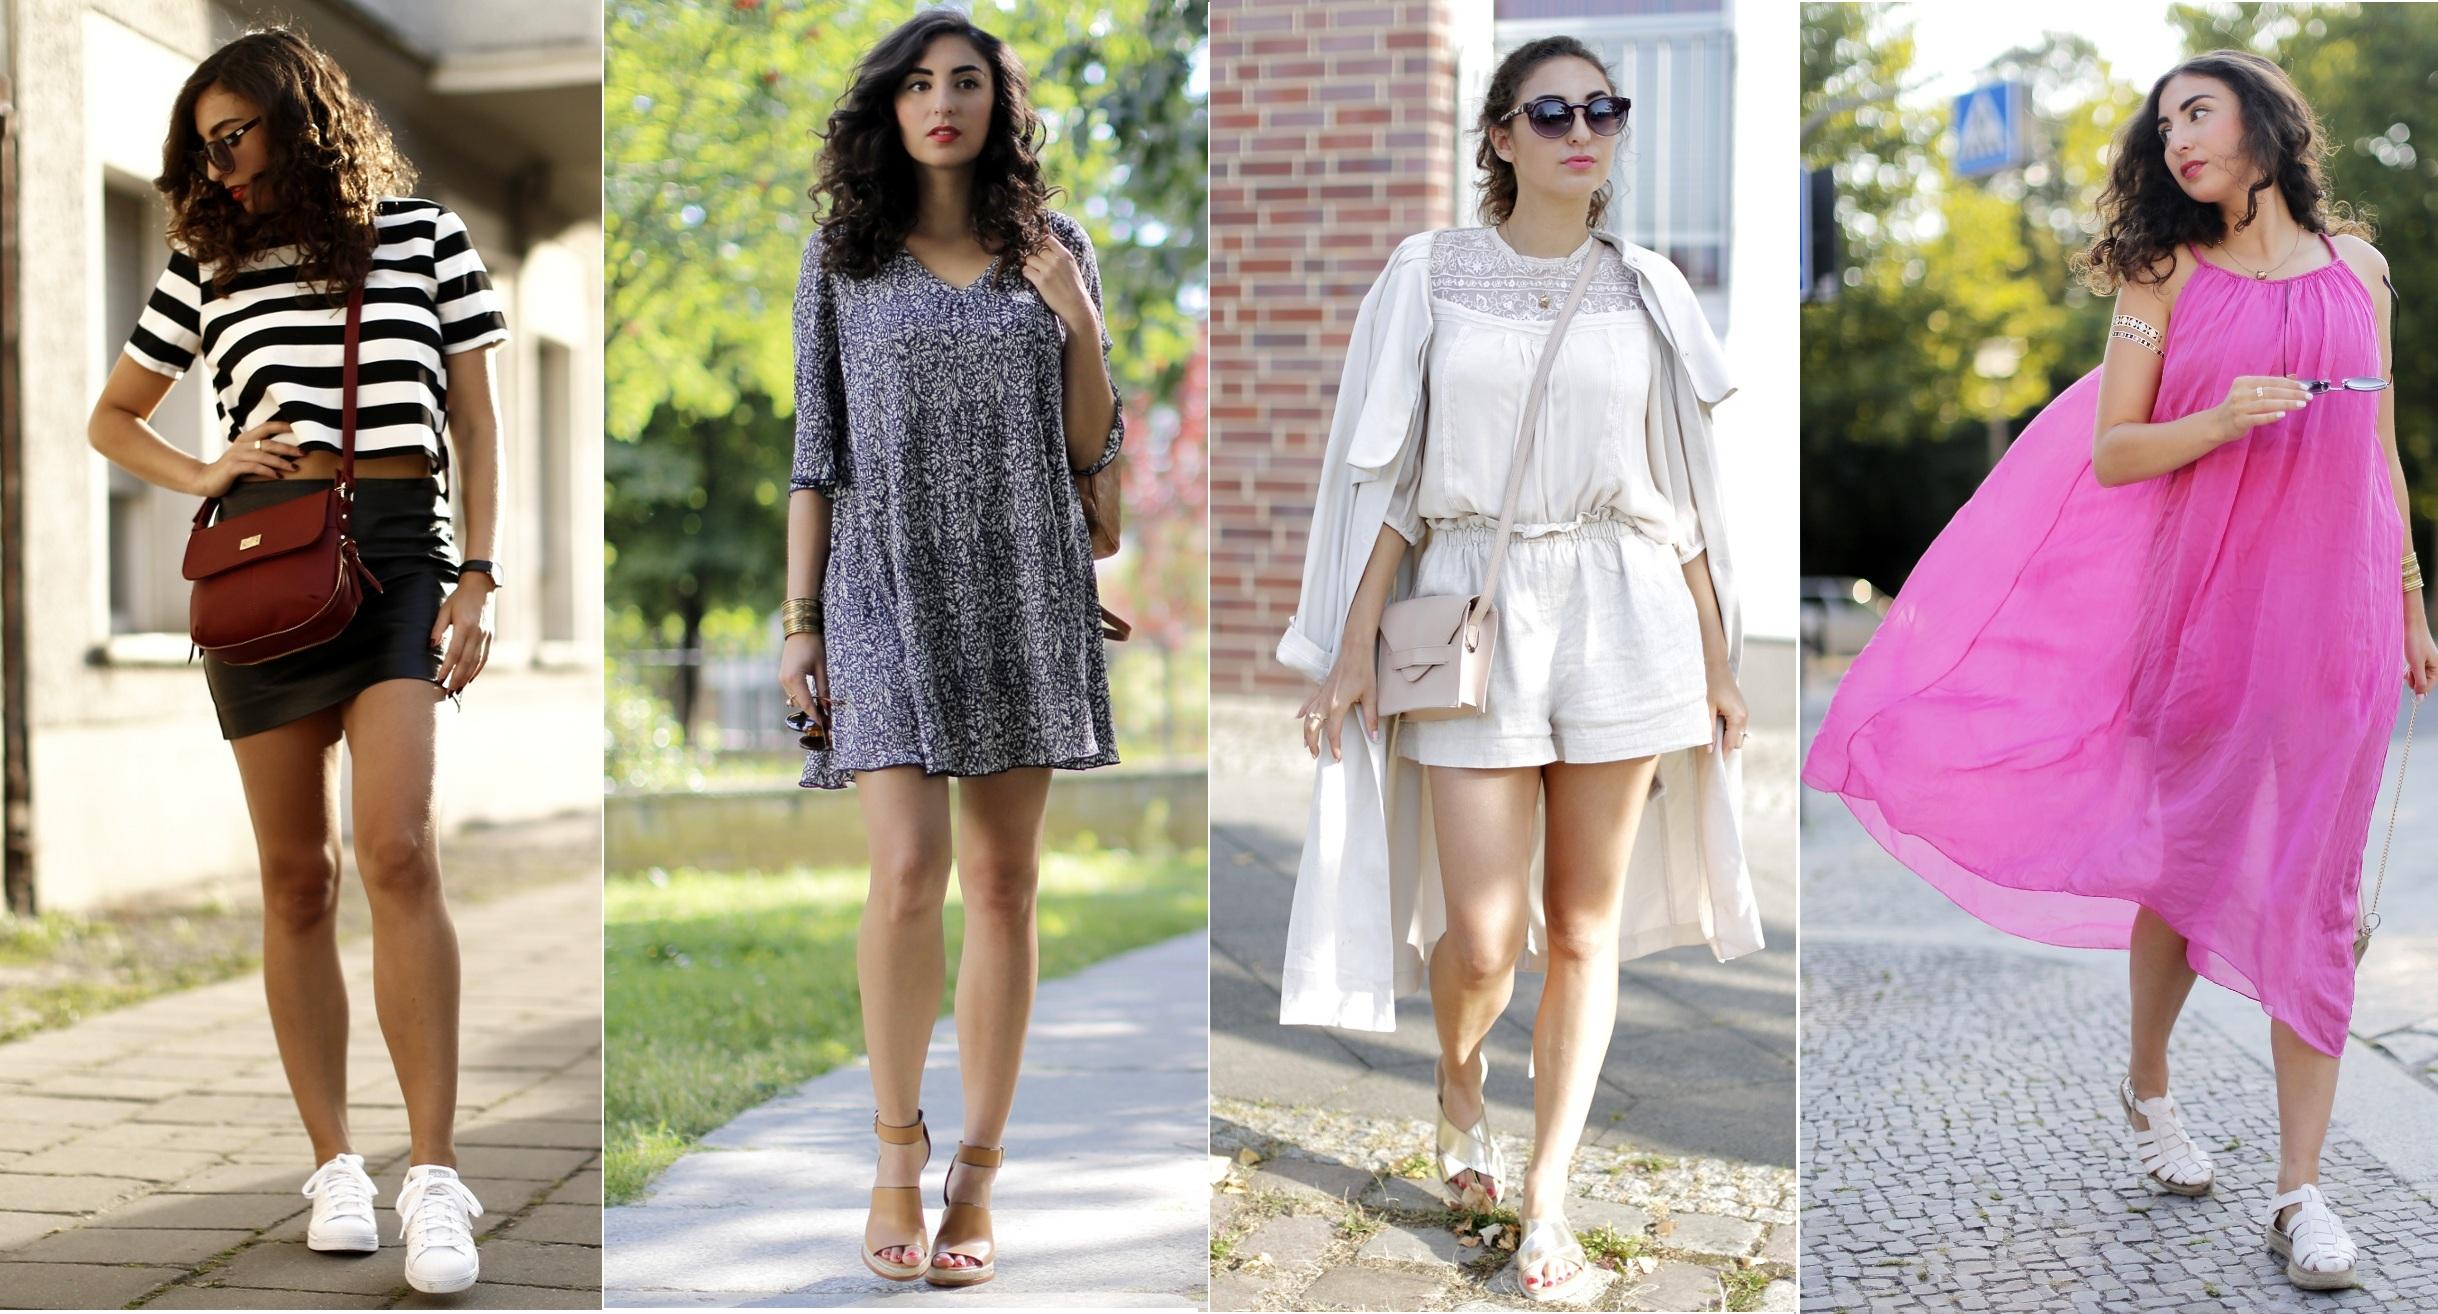 Hot Summer Looks Samieze fashionblogger Modeblog berlin Outfit review lookbook